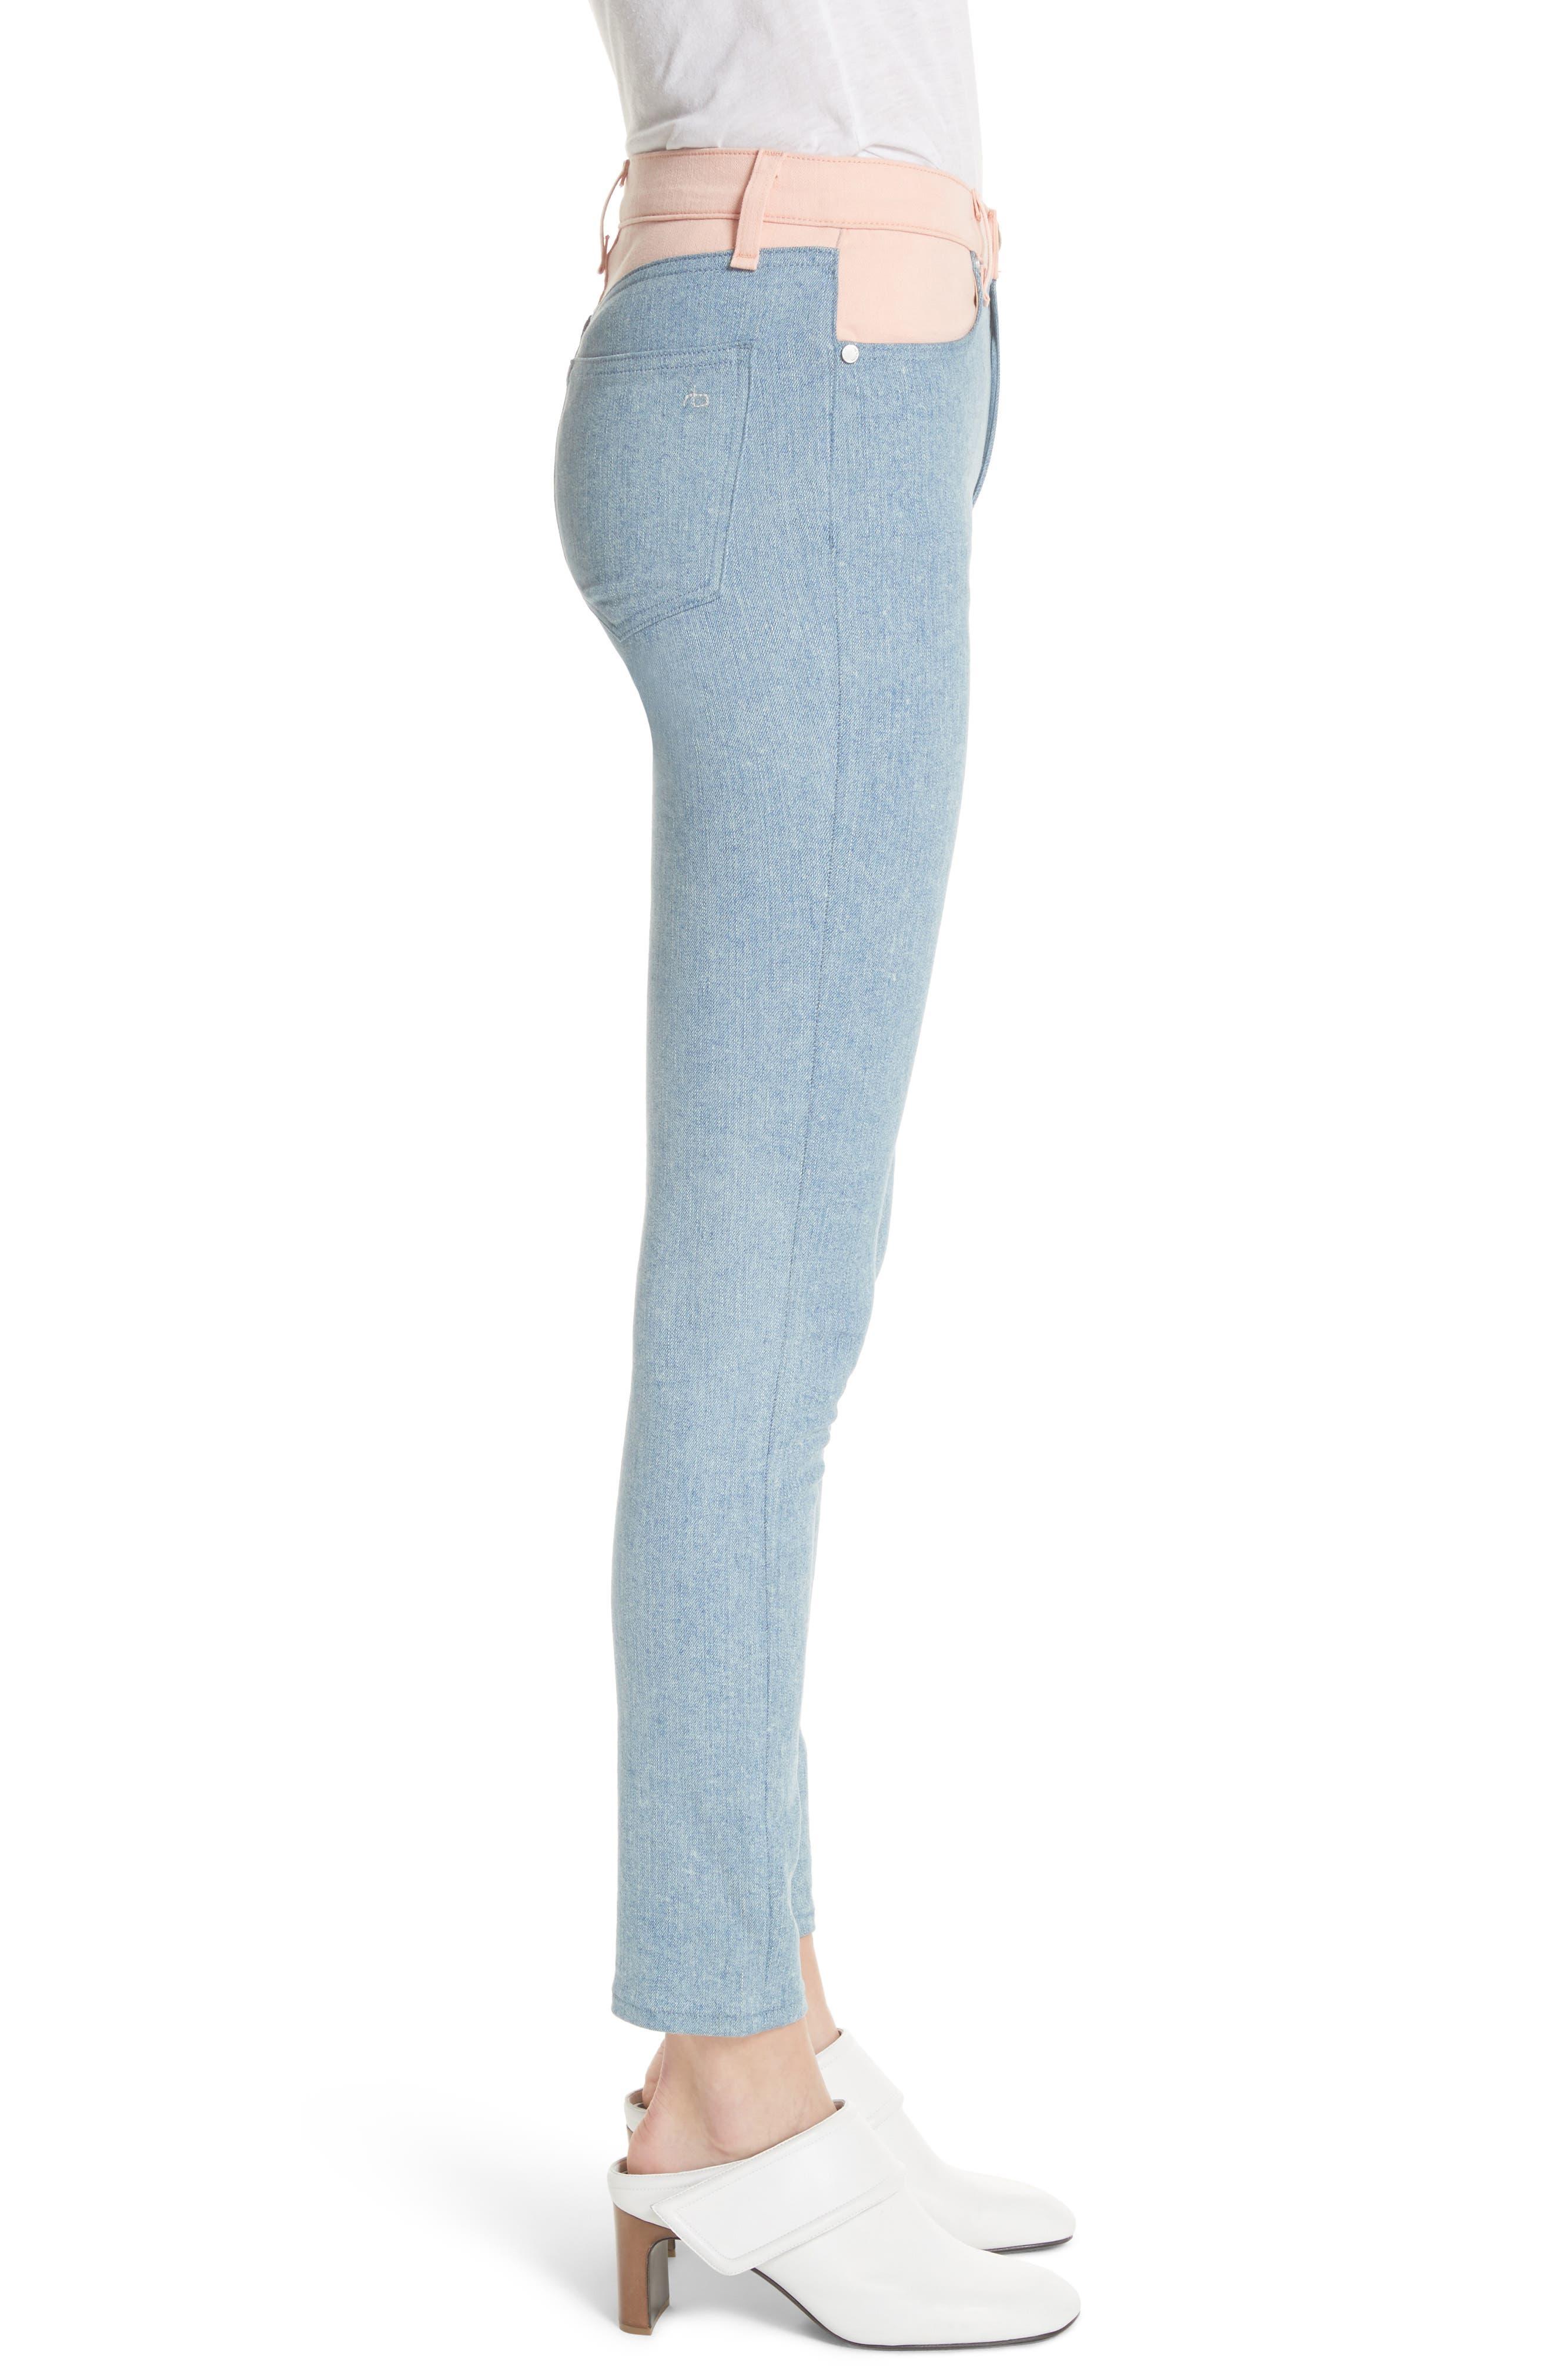 Phila Skinny Jeans,                             Alternate thumbnail 3, color,                             450